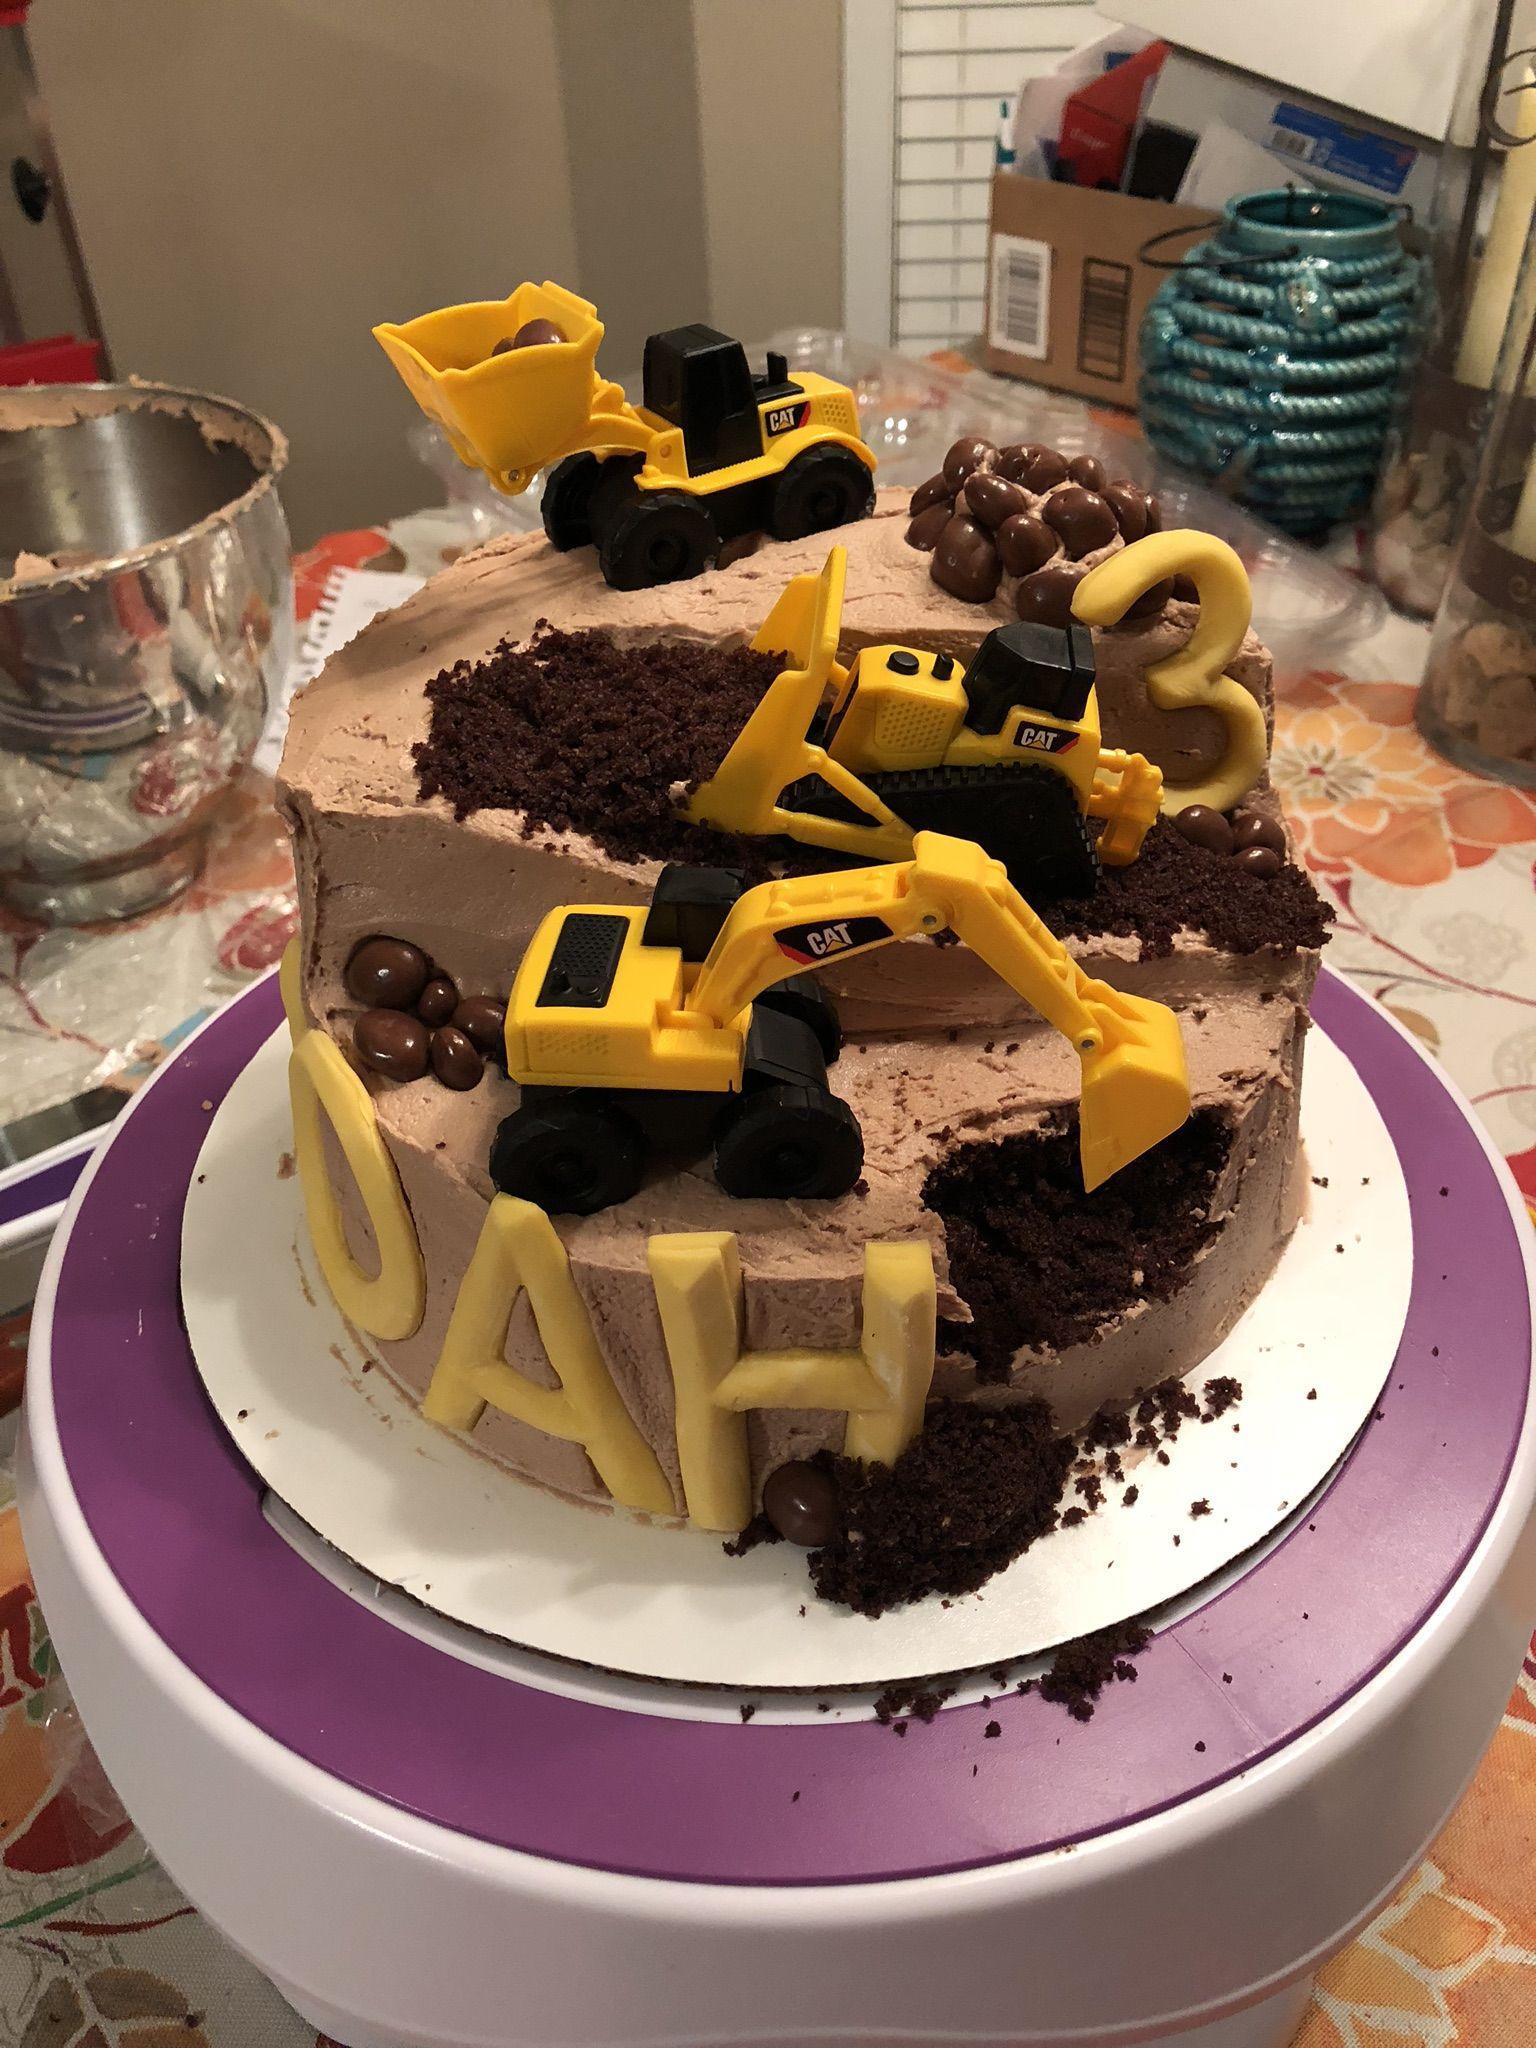 Tremendous Tonka Truck Birthday Cake Truck Birthday Cakes Tonka Truck Cake Funny Birthday Cards Online Necthendildamsfinfo